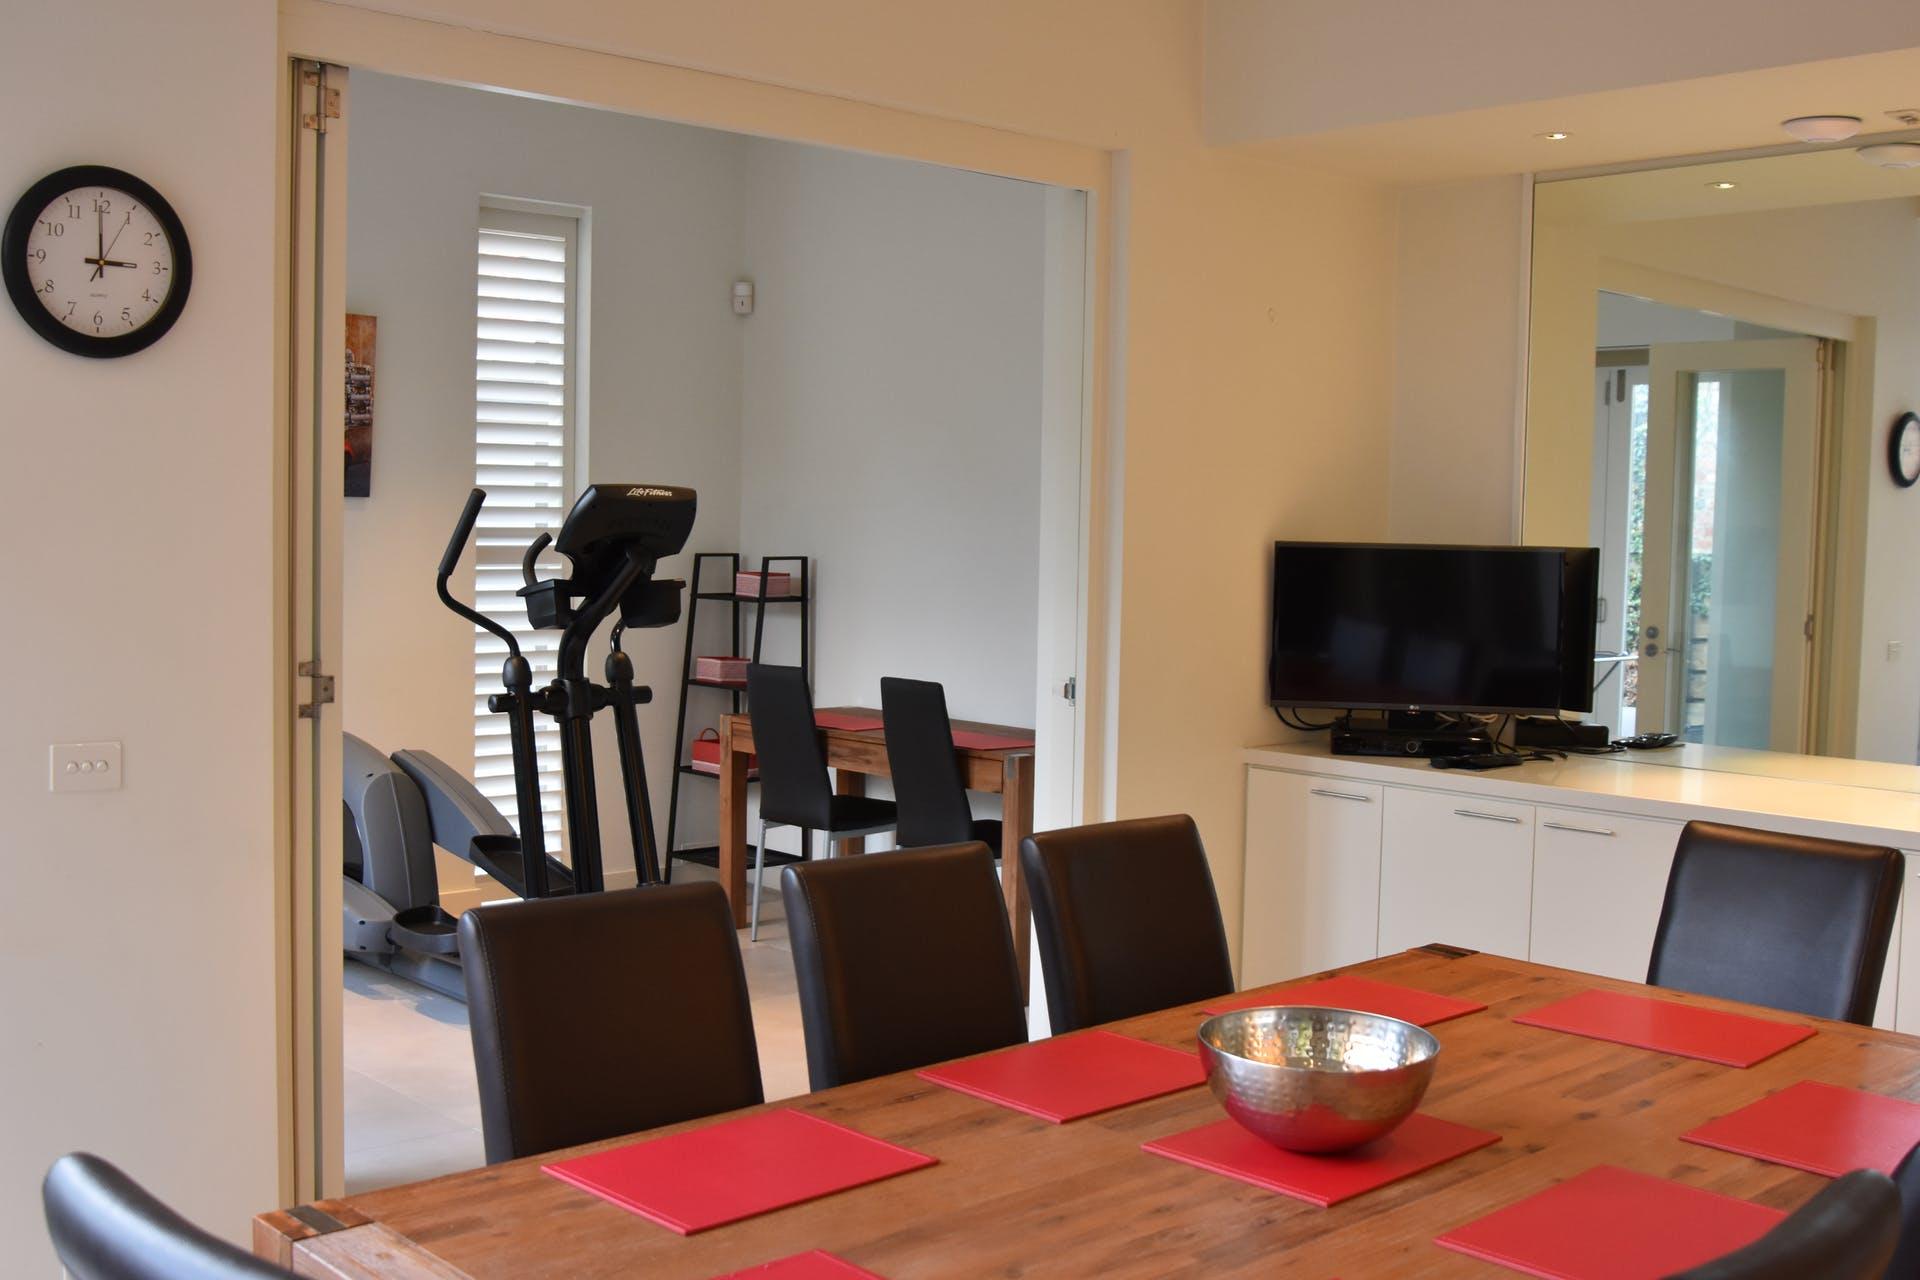 601-king-street-west-melbourne-student-accommodation-Melbourne-Living-Area-2-Unilodgers